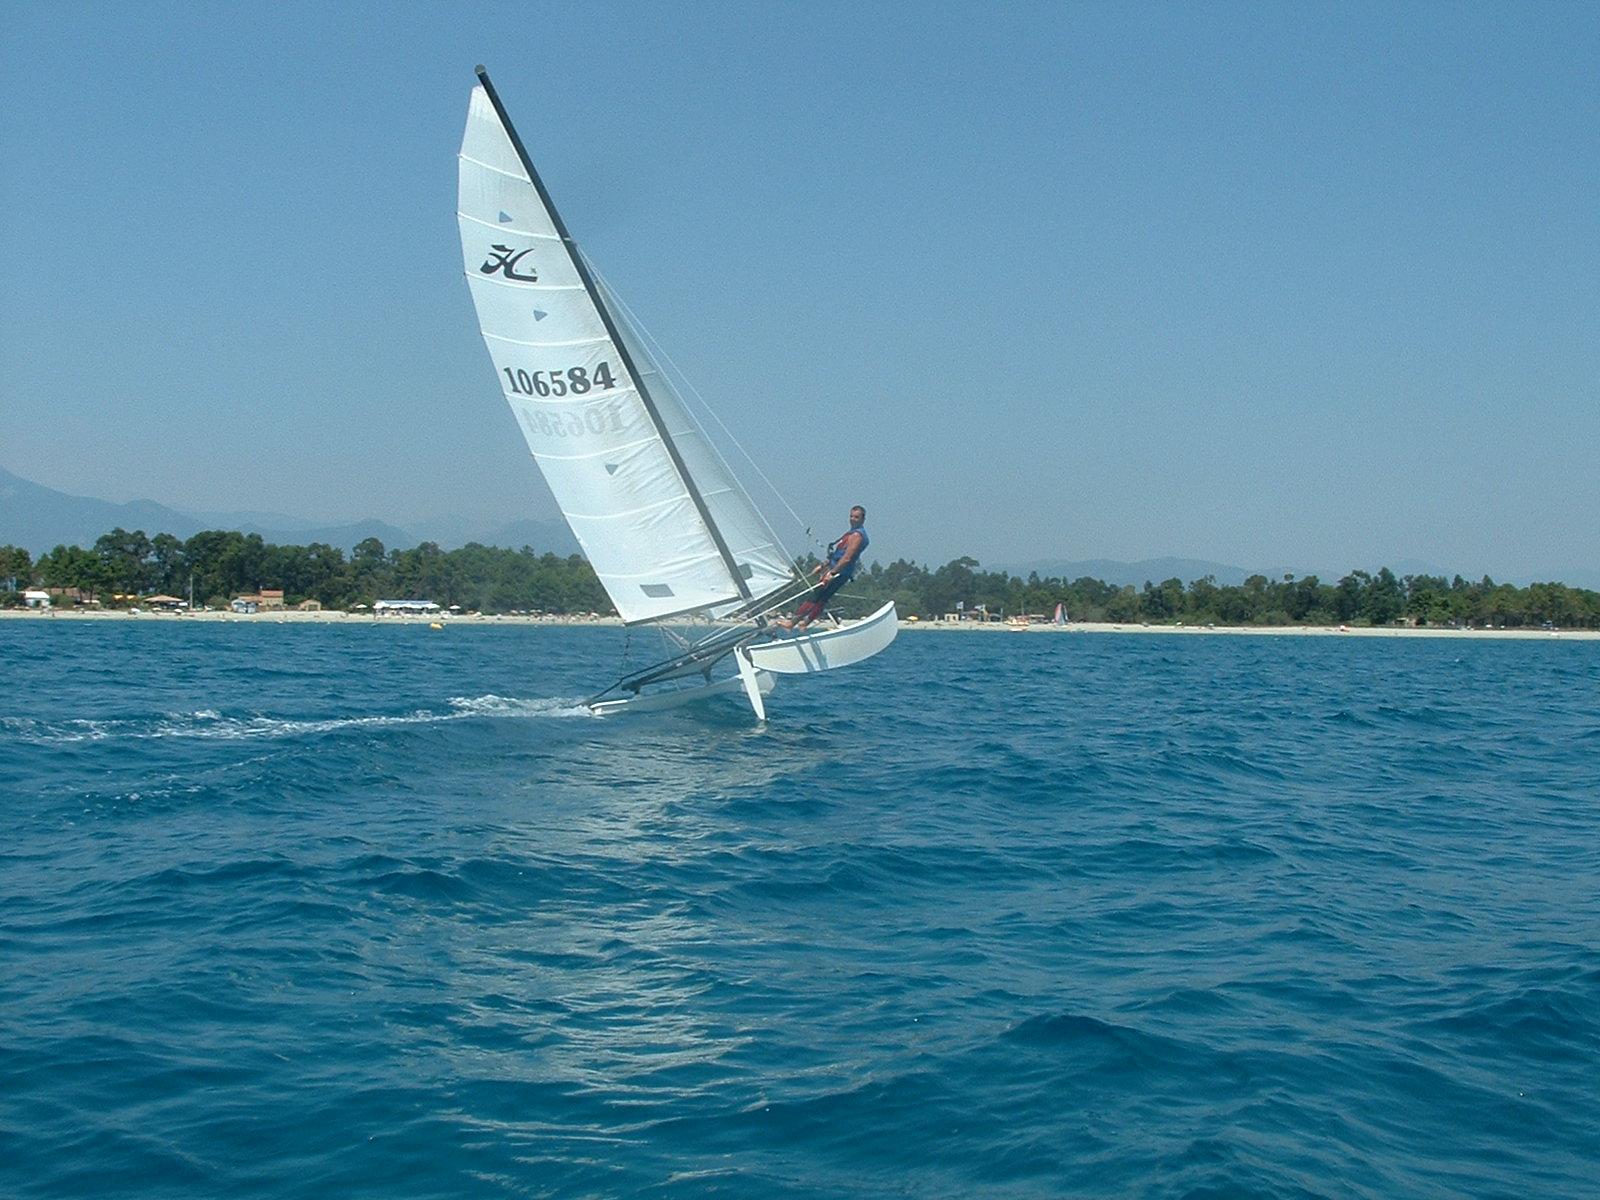 cata-1-flotteur-ghisonaccia-fun-orizonte